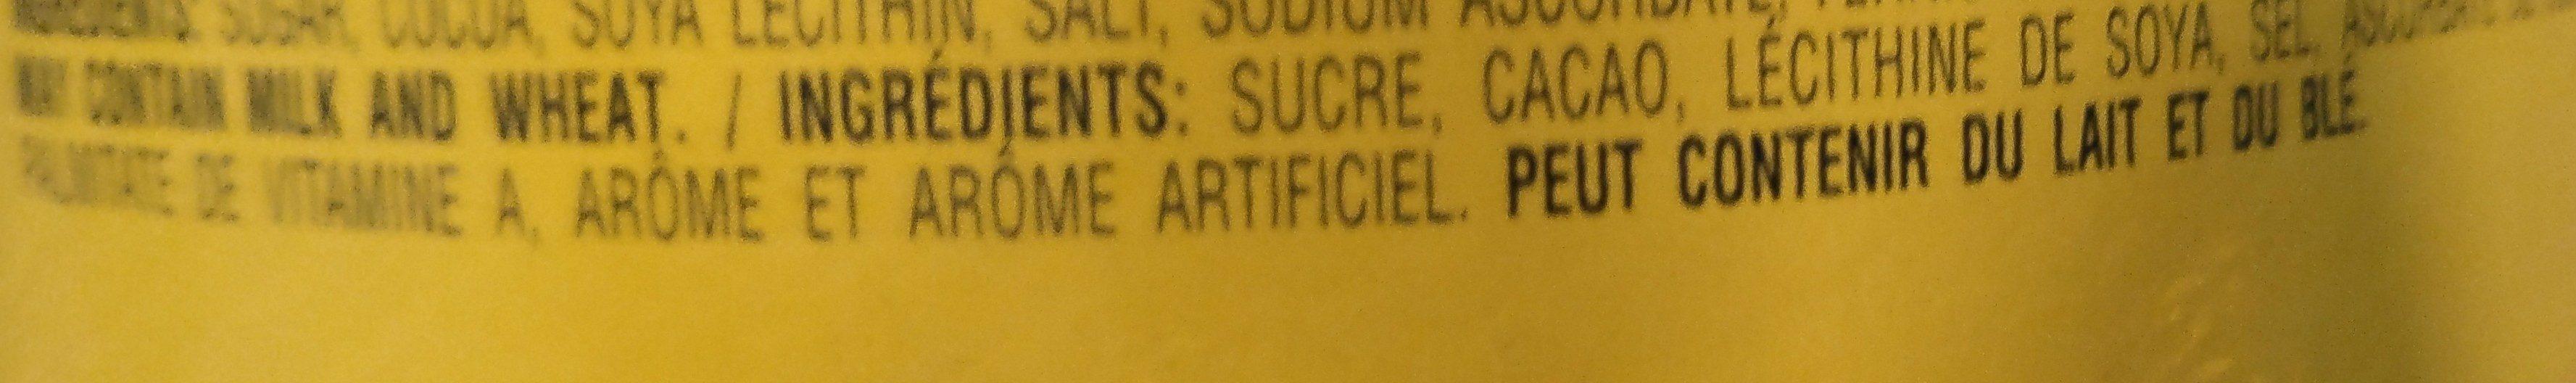 Nesquik Less Sugar - Ingredients